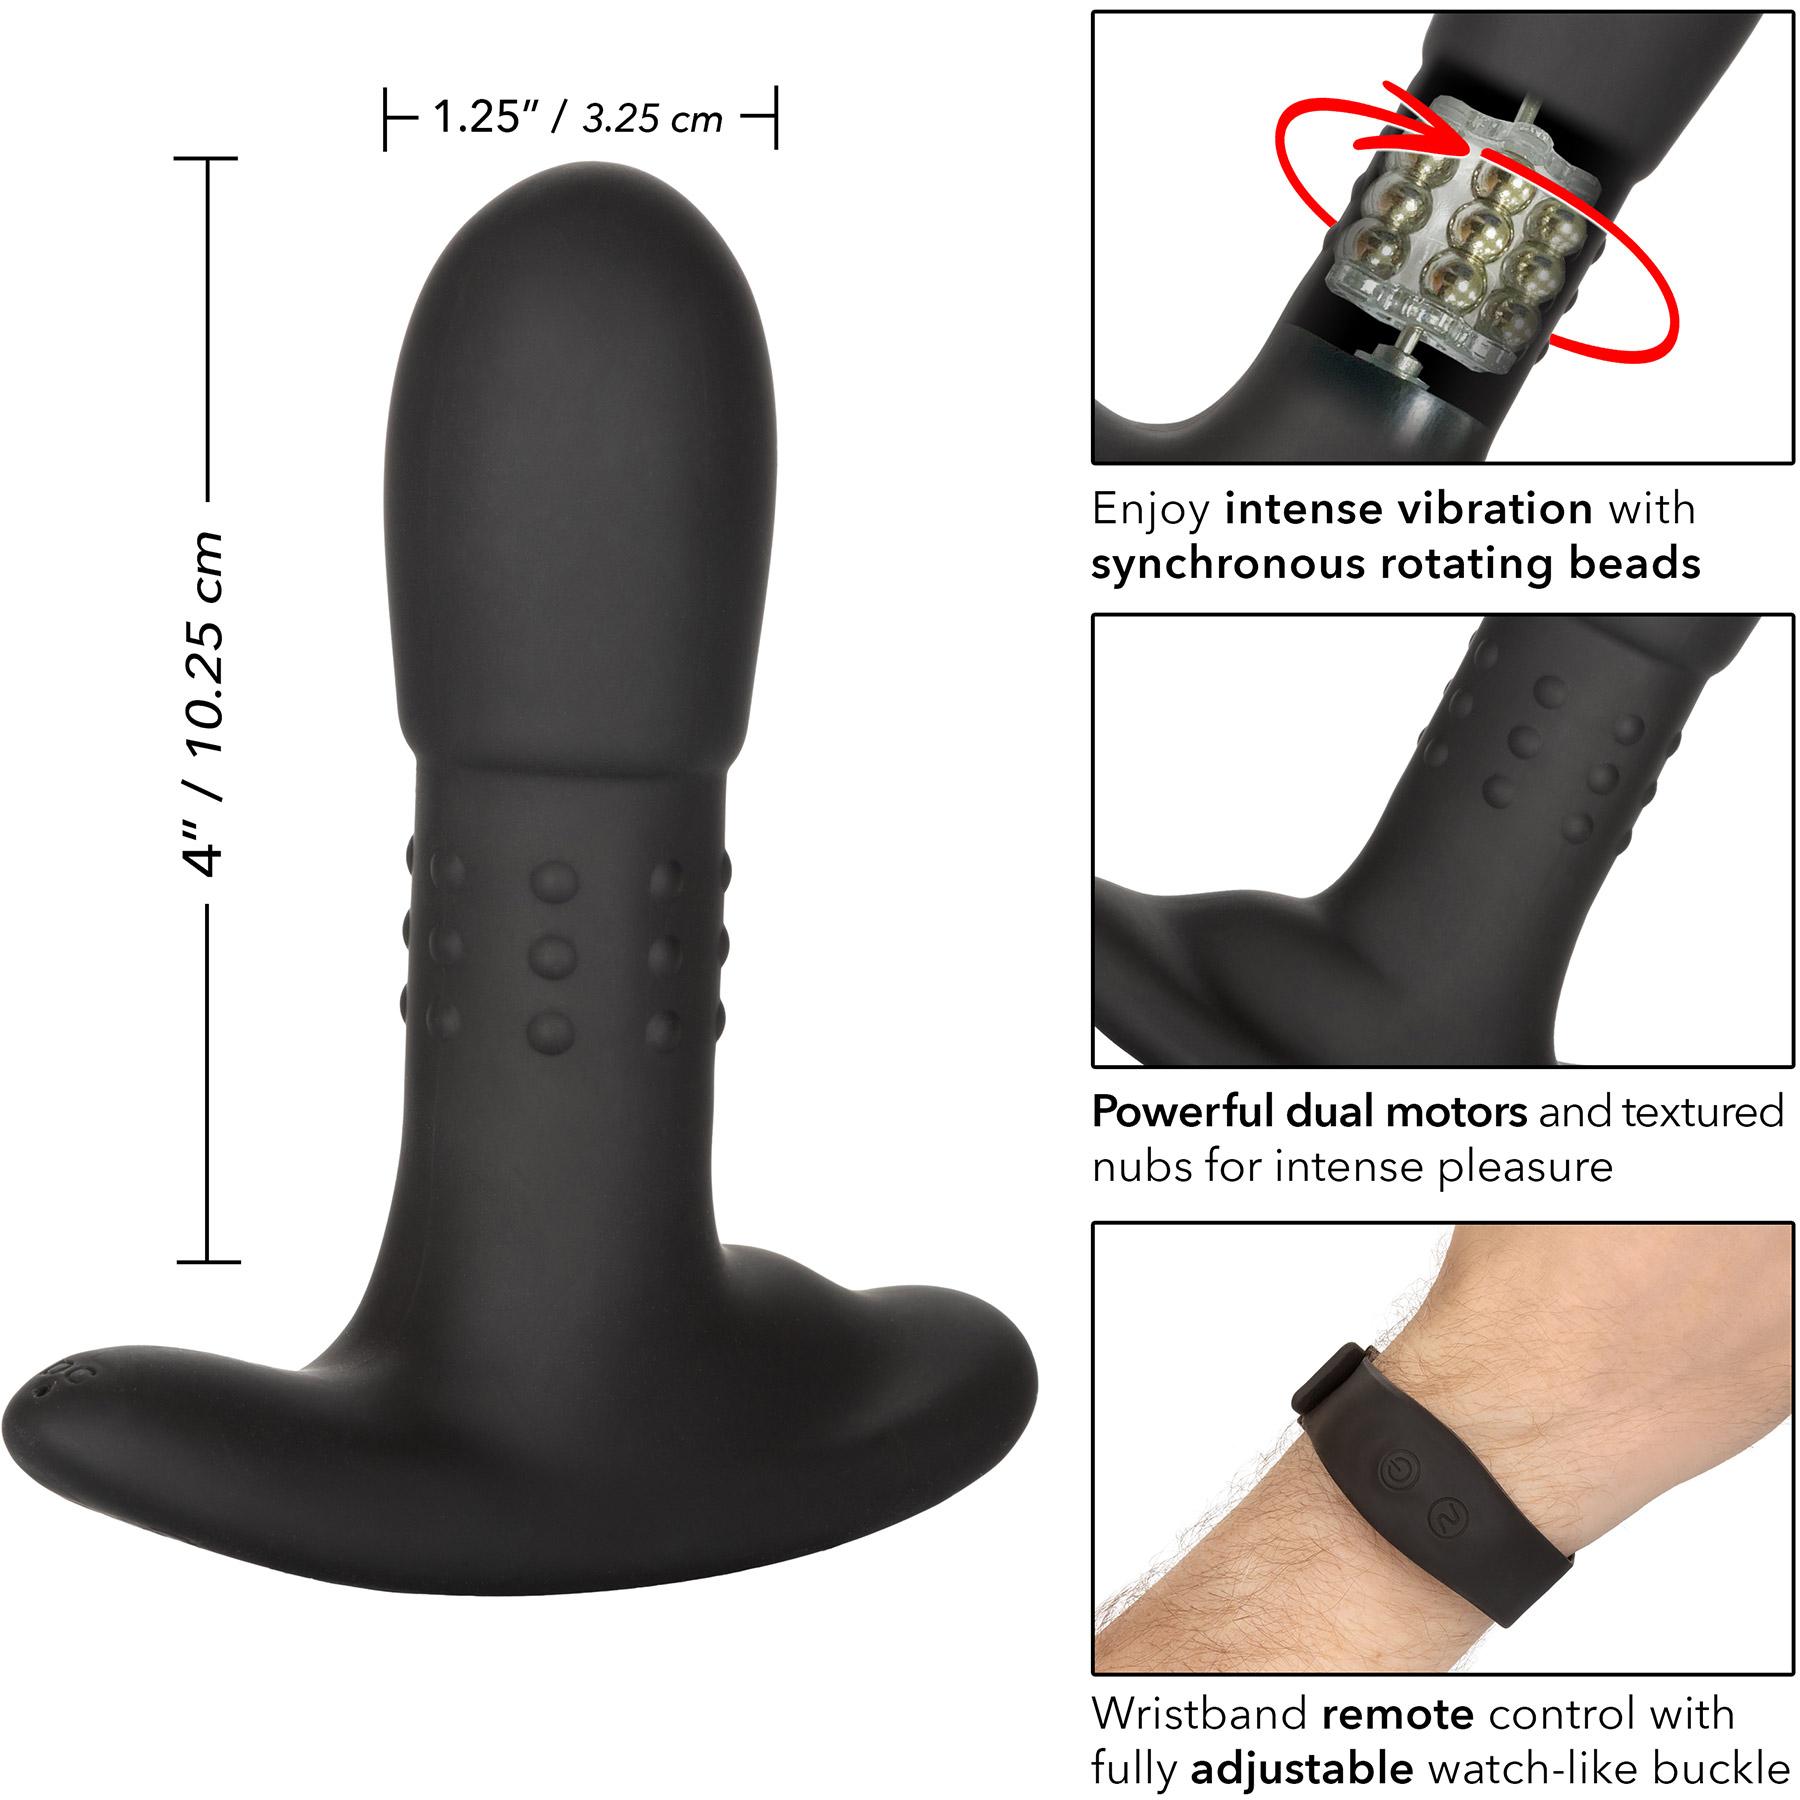 Eclipse Wristband Remote Beaded Probe Silicone Vibrating Anal Probe - Measurements